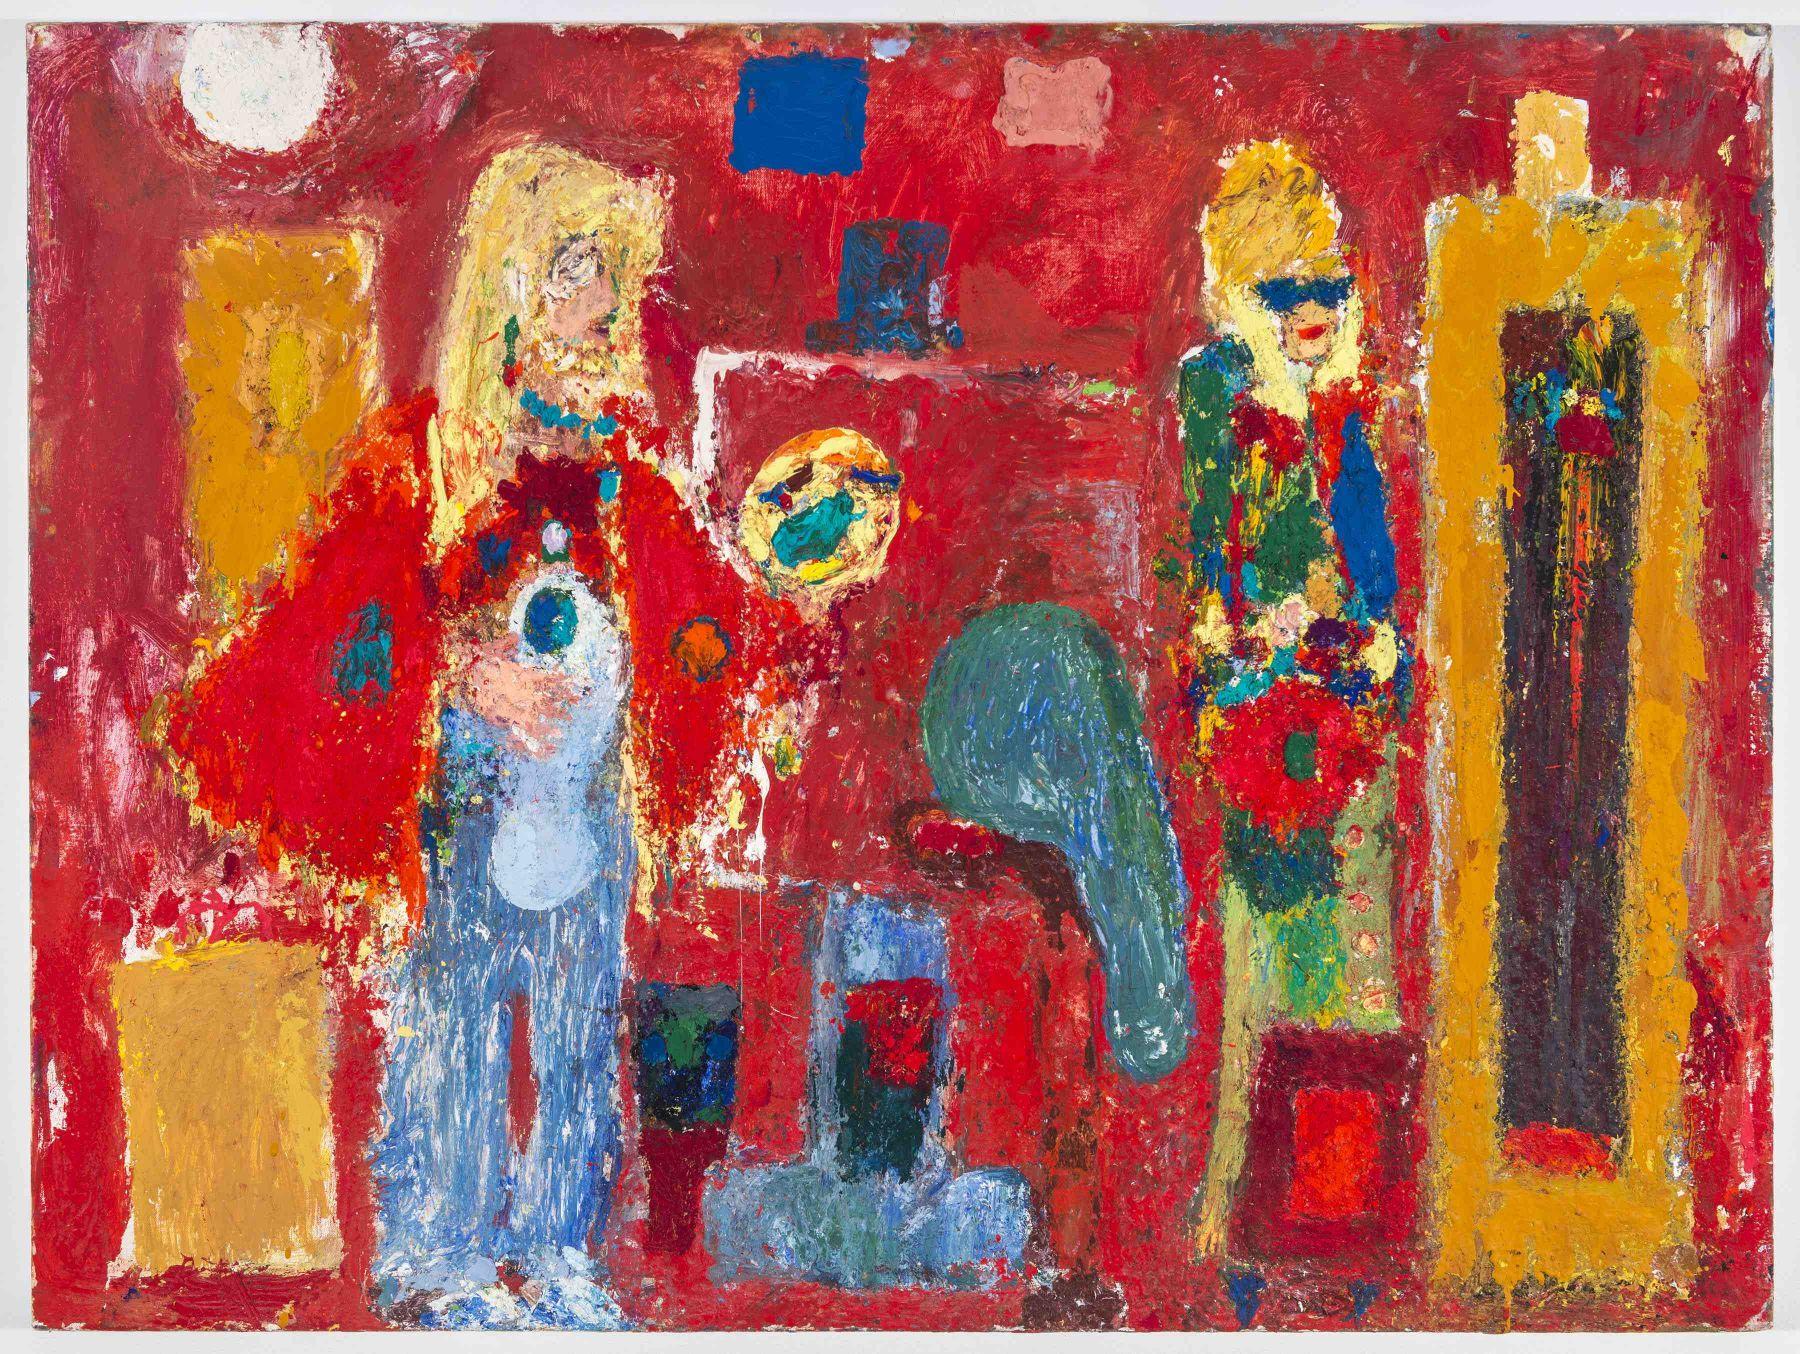 THOMAS TROSCH, The Unknown Masterpeice, 2017